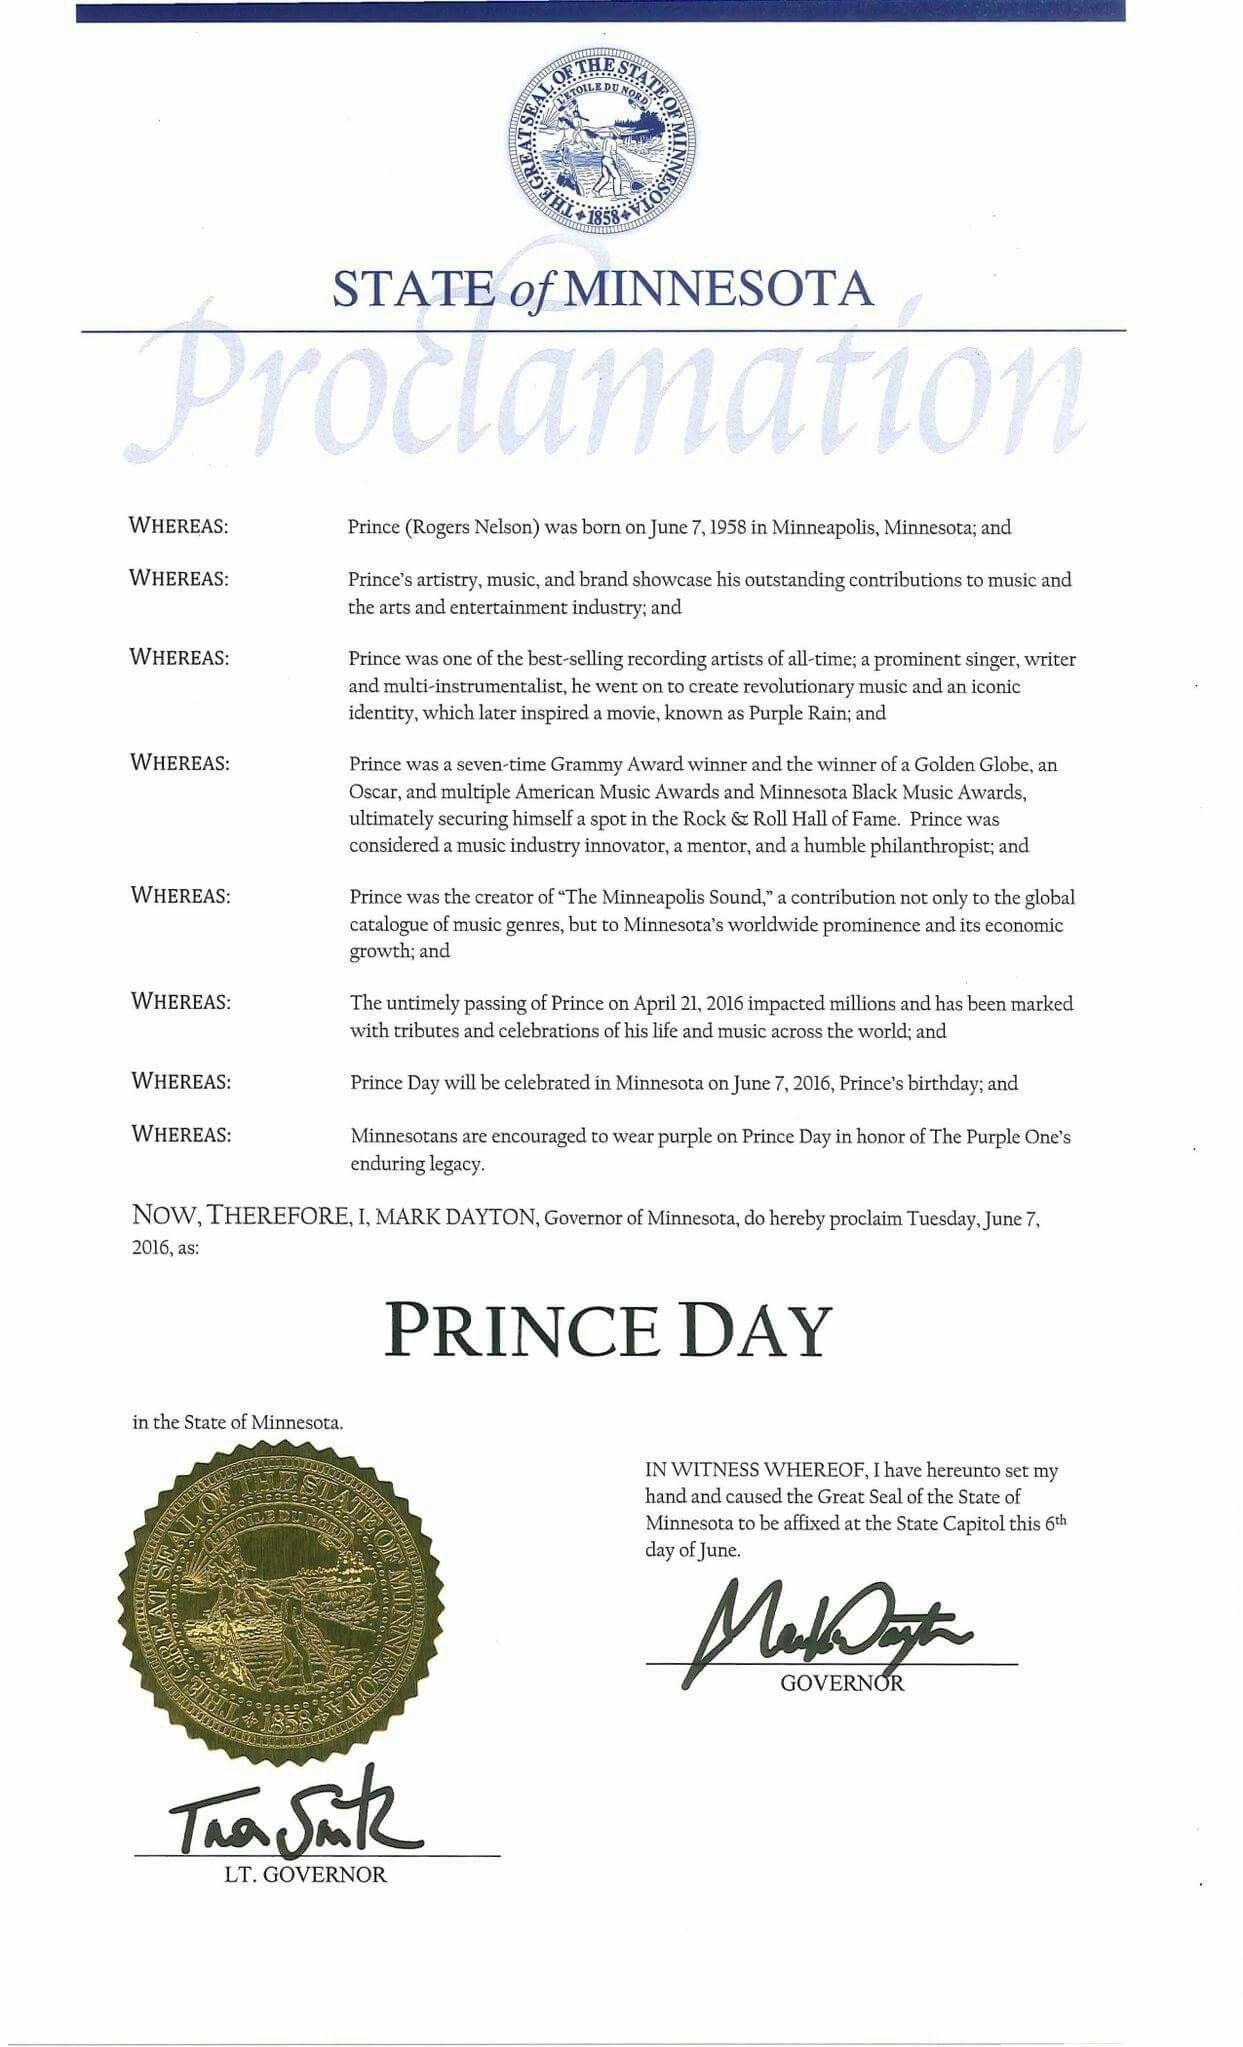 Prince Day Prince Day Prince Rogers Nelson 7 Prince